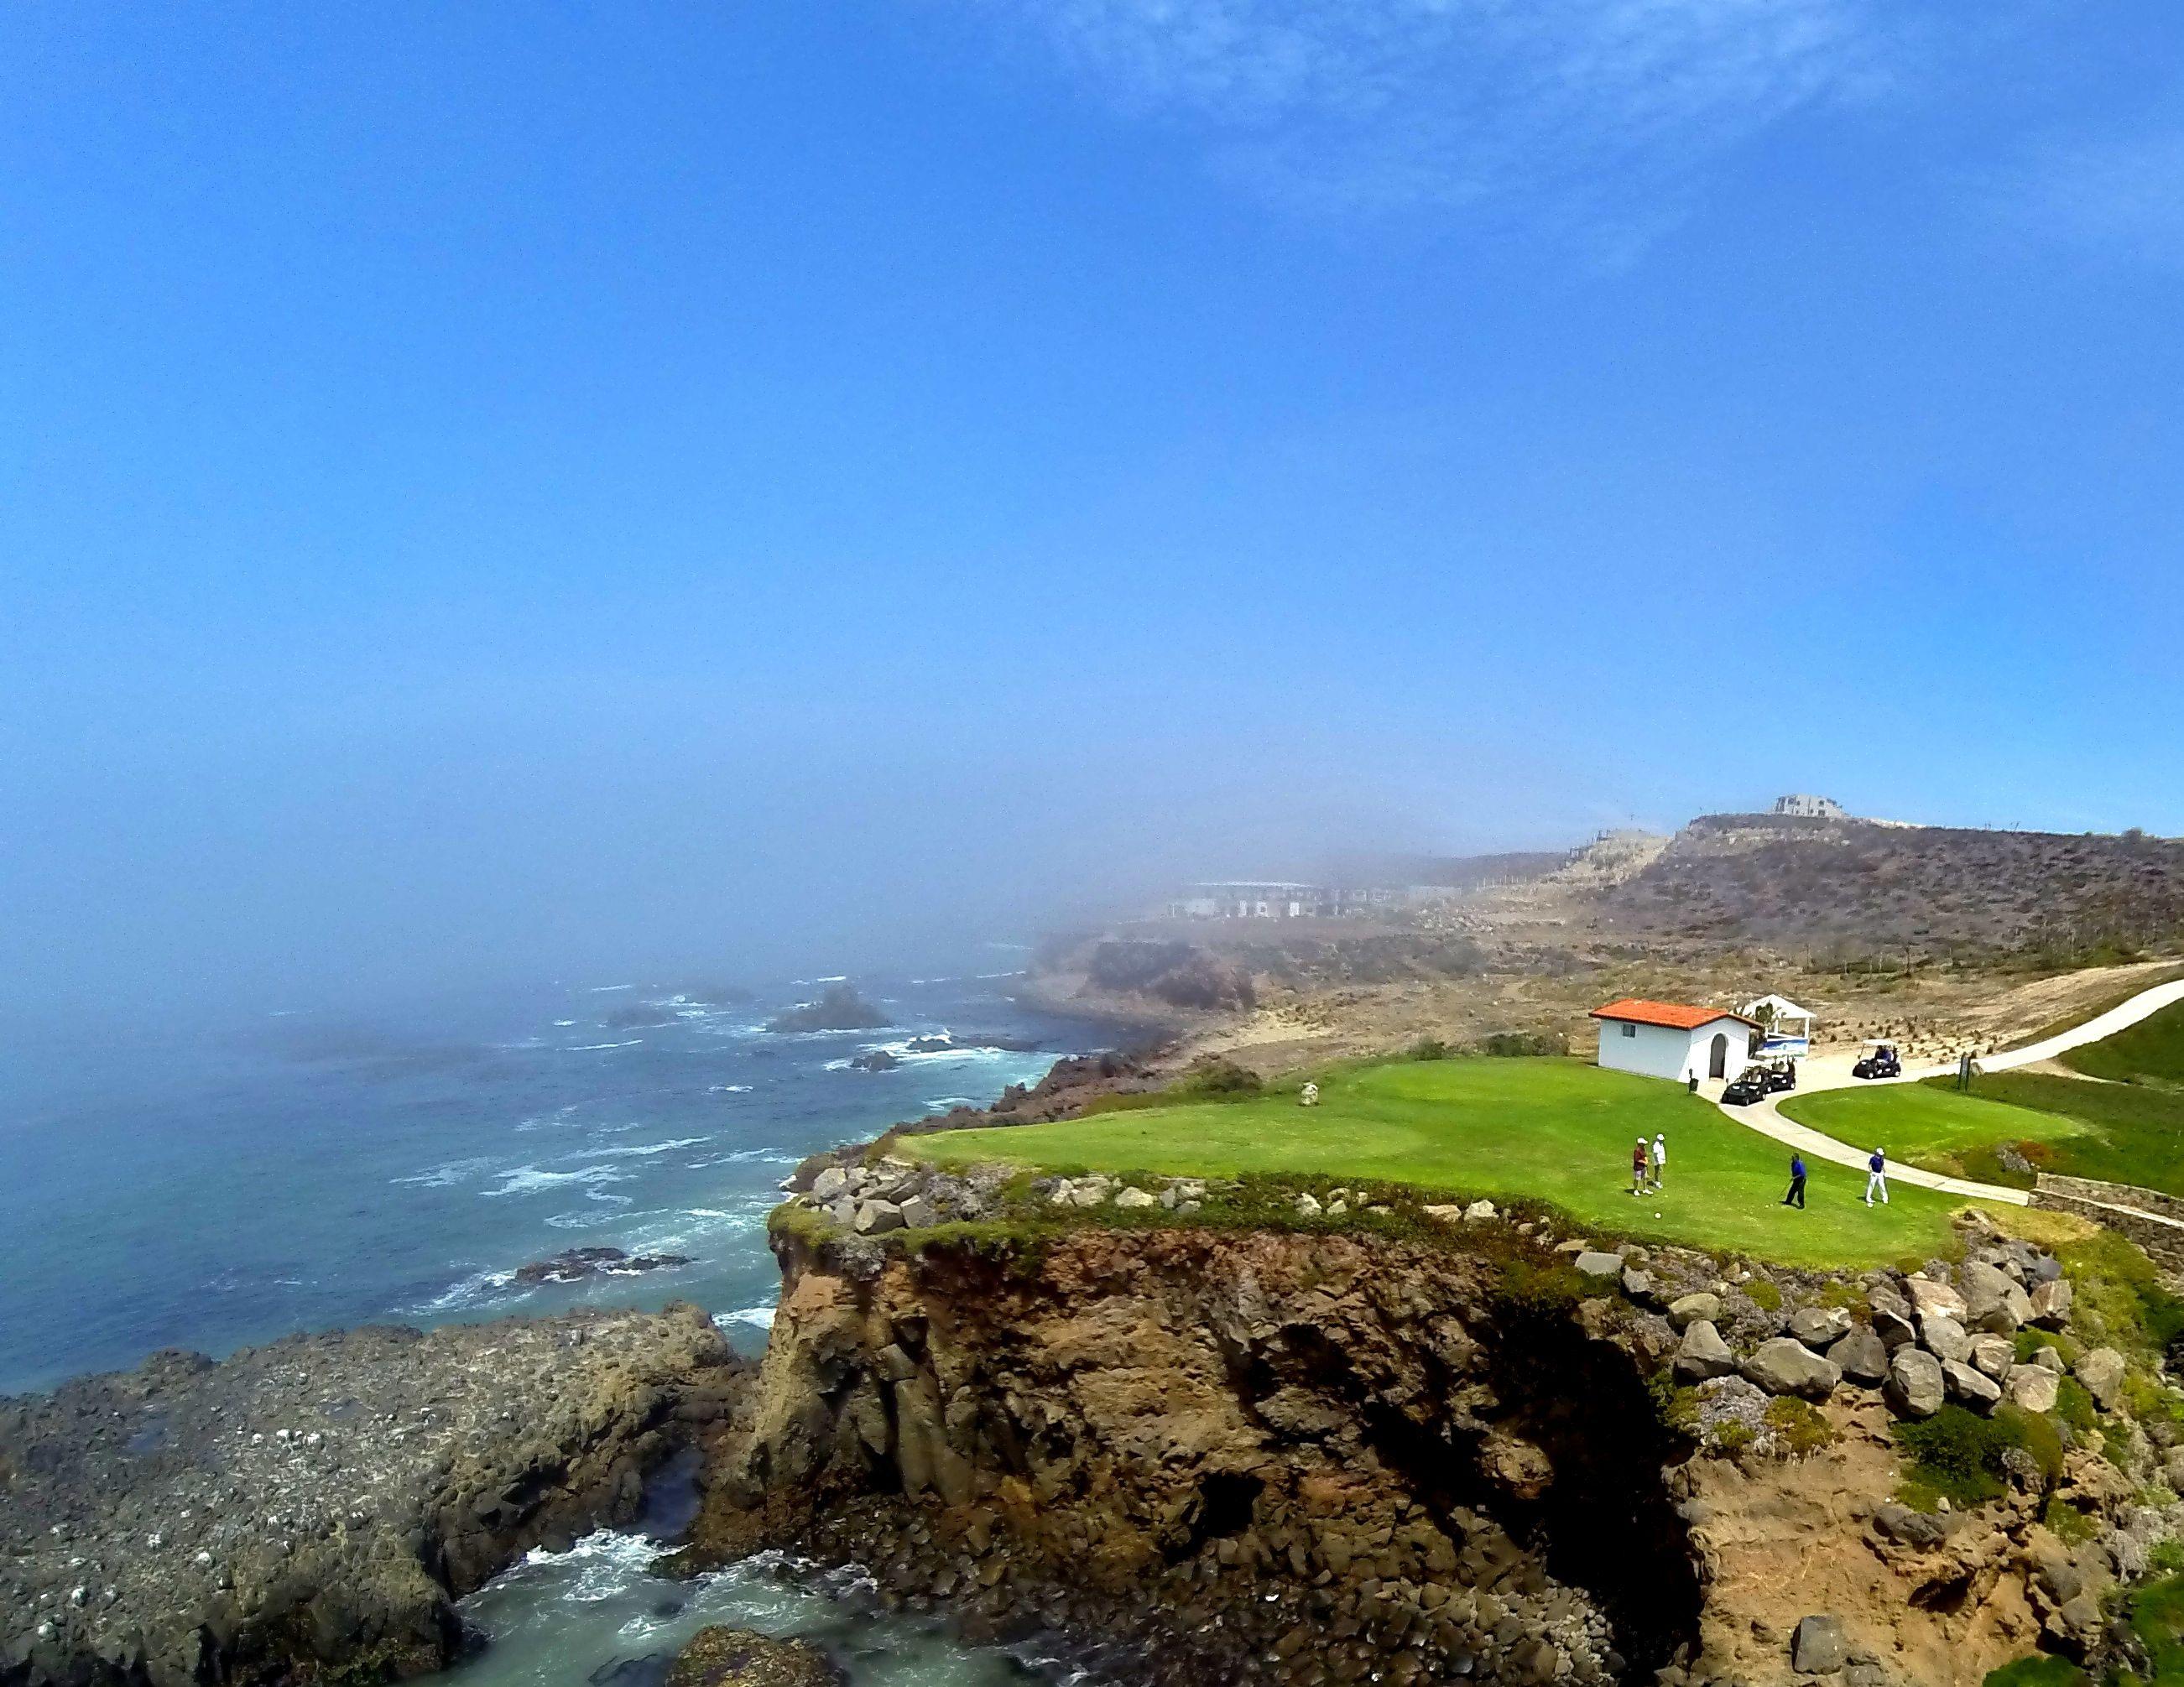 15+ Bajamar ocean front golf resort ideas